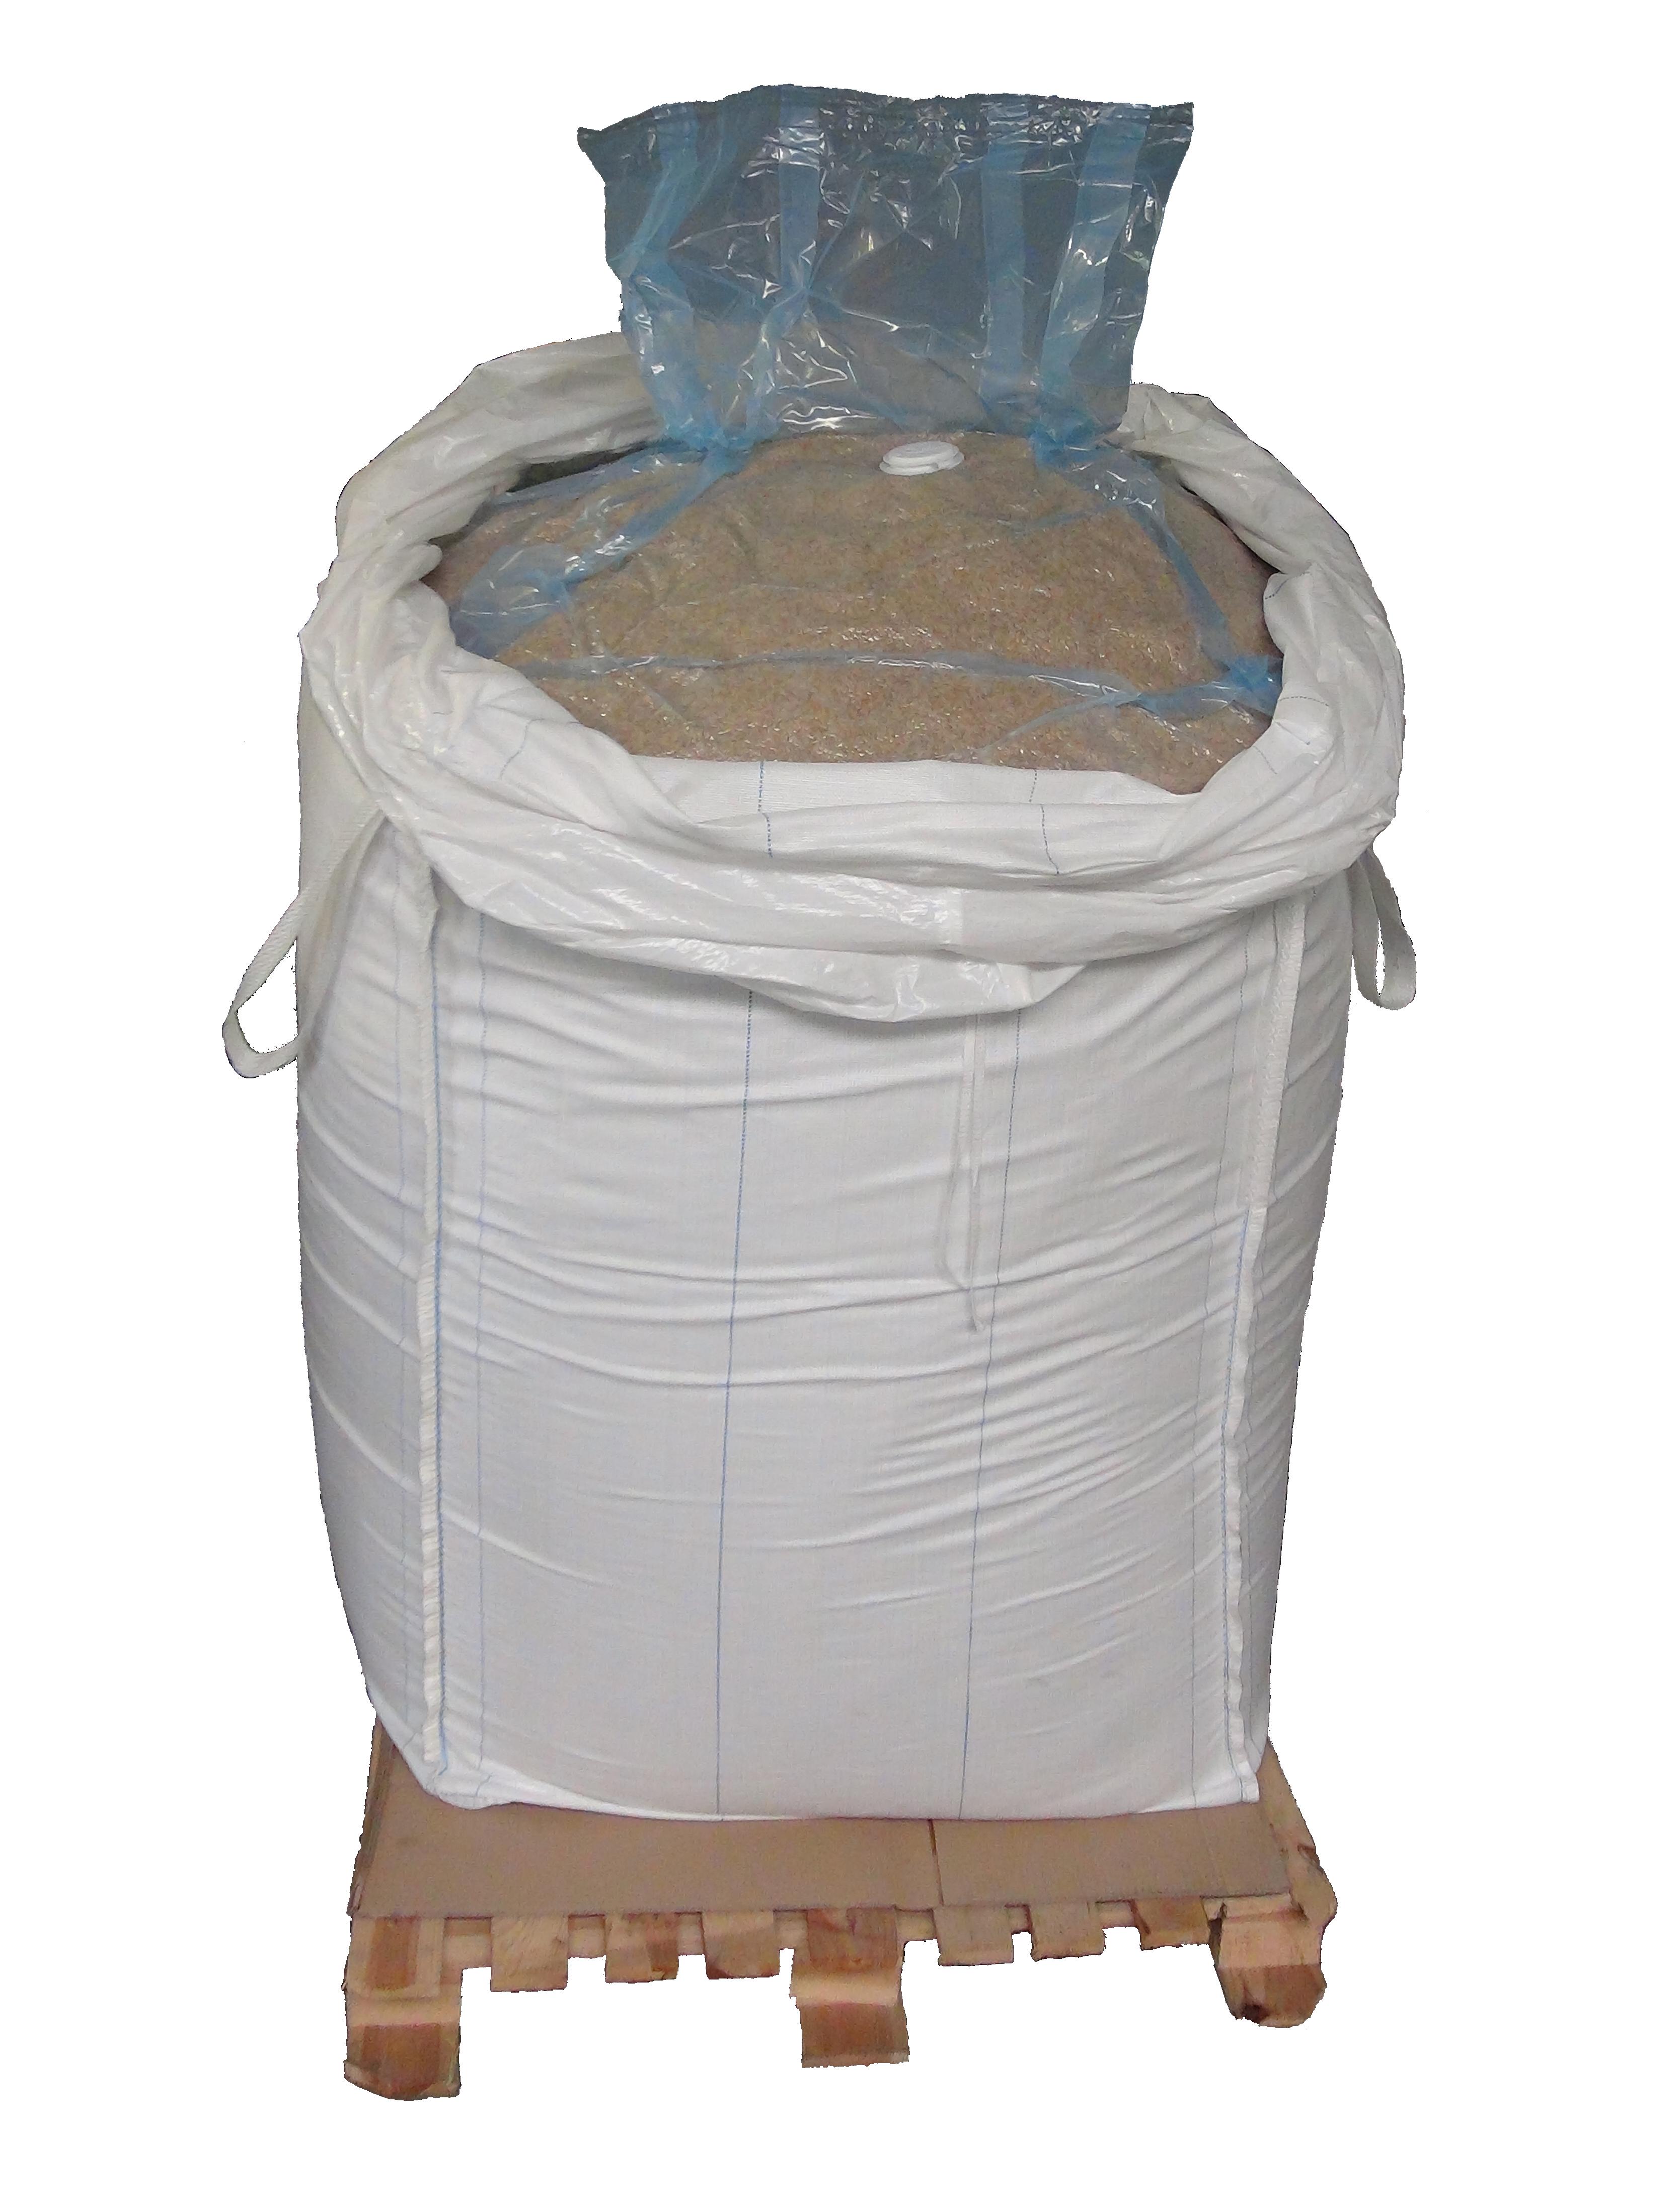 vQm Plastic barrier liner for FIBC